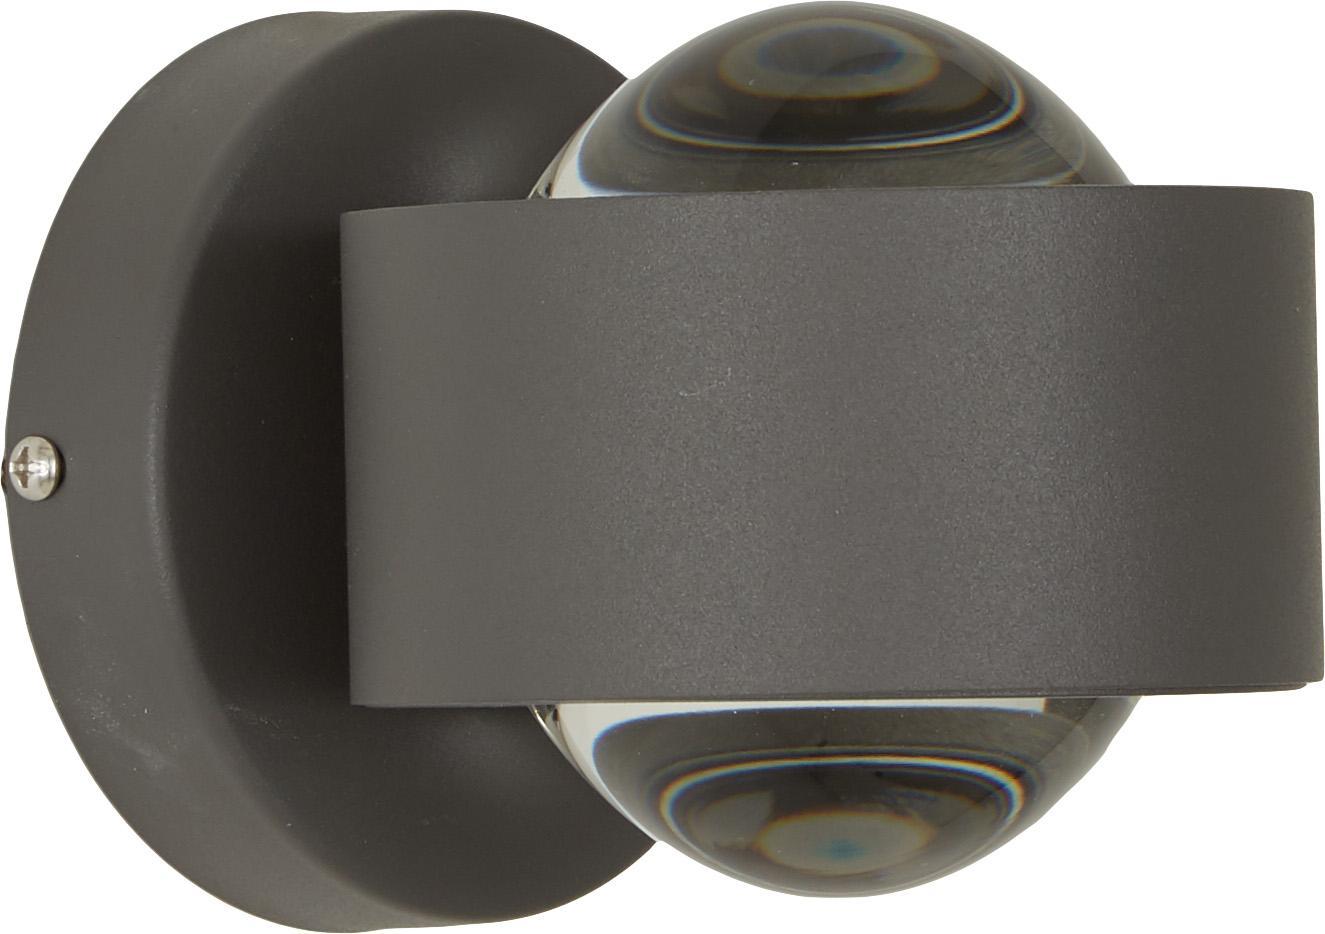 Aplique XS LED Ono, Negro, An 9 x Al 8 cm